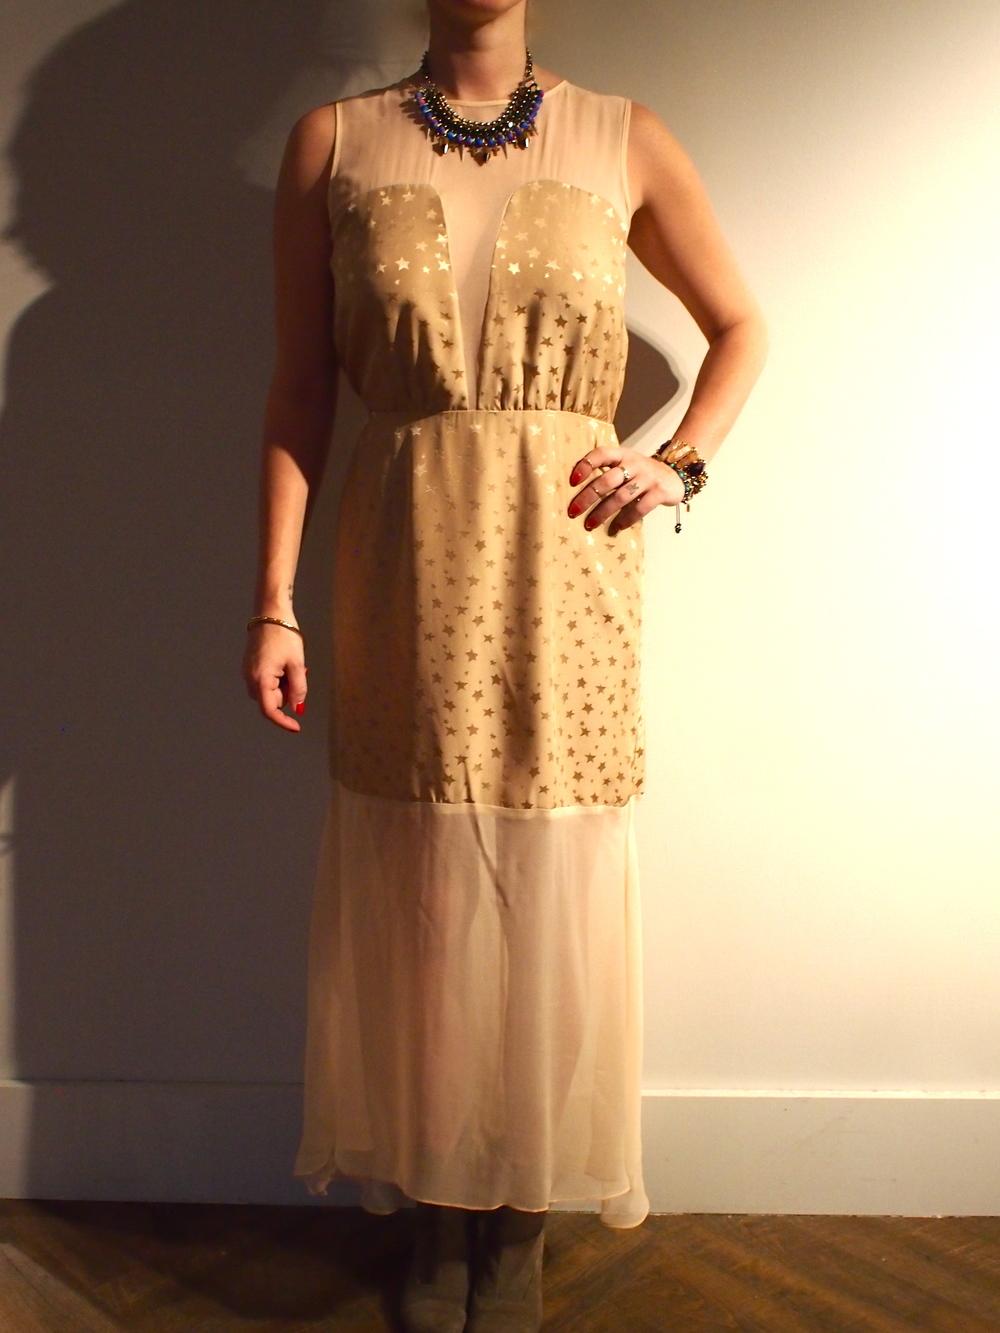 Corey Lynn - Chloe Peekaboo Dress: $288